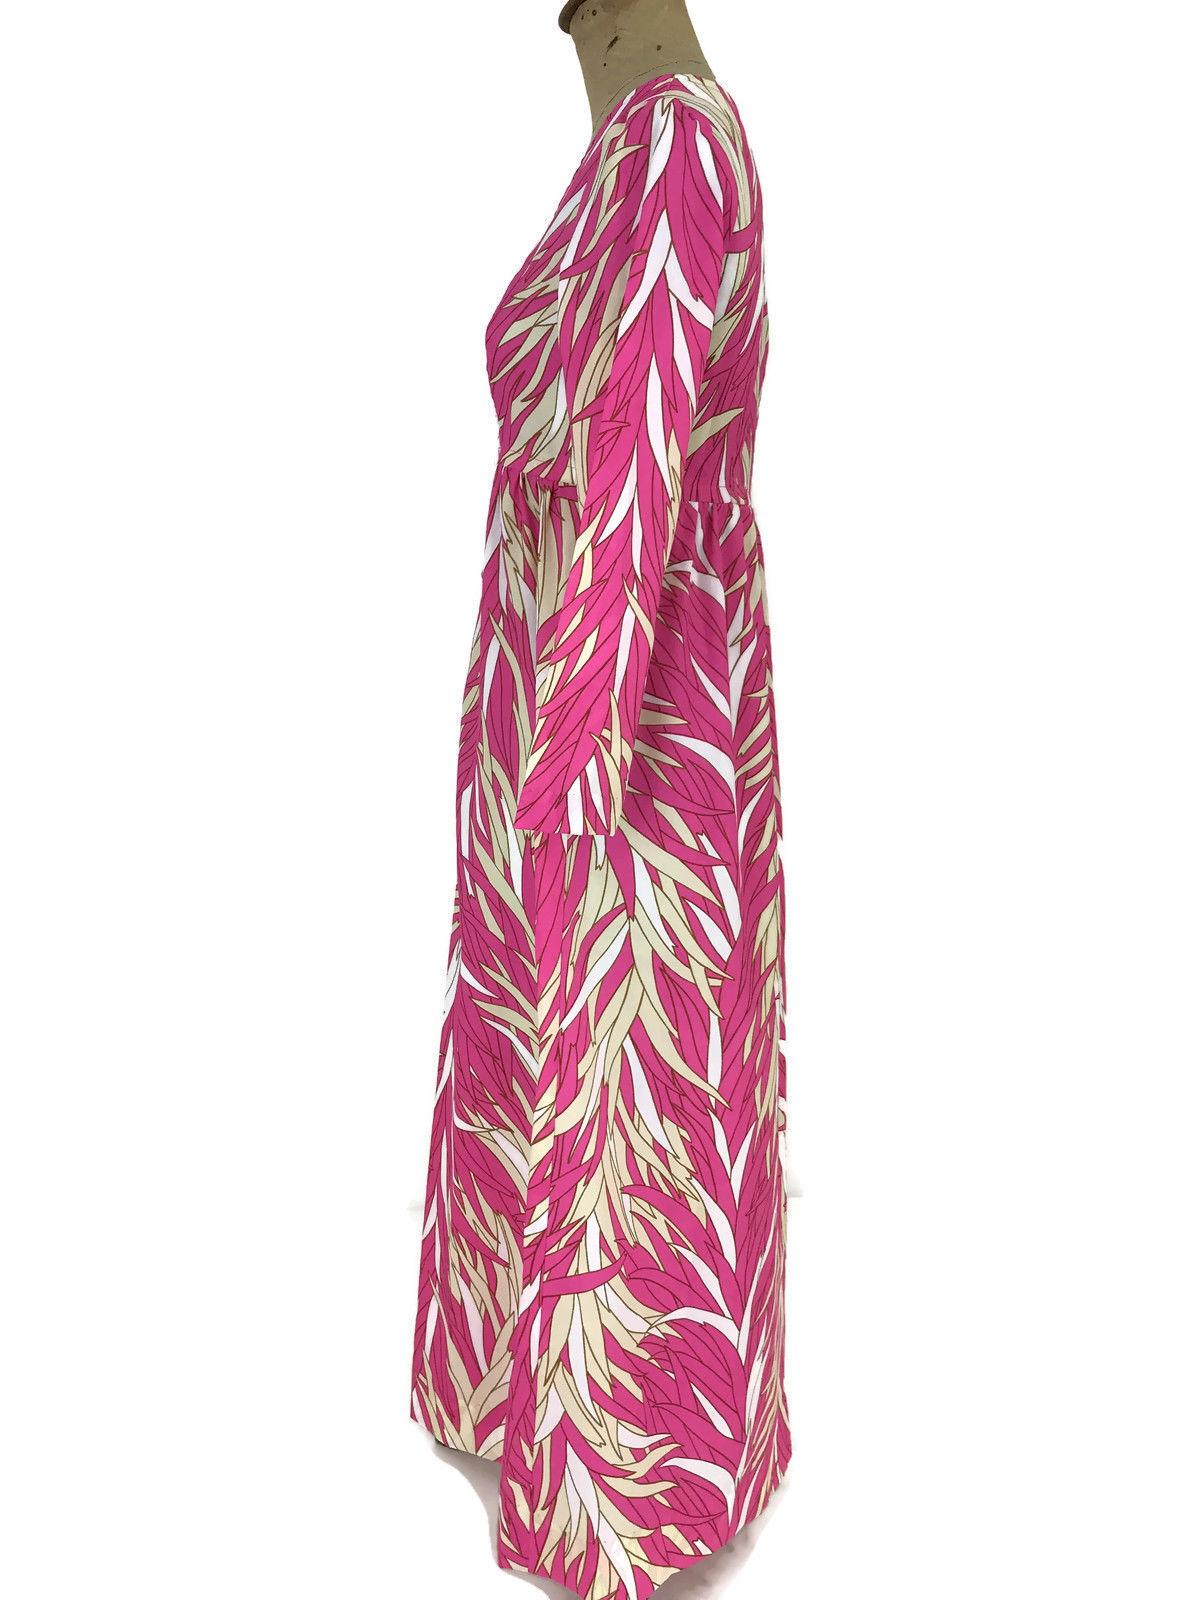 5b567cf534ca Vintage Ca. 1970s Sears Hawaiian Fashions Women's Dress Hot Pink Tropical  MuuMuu